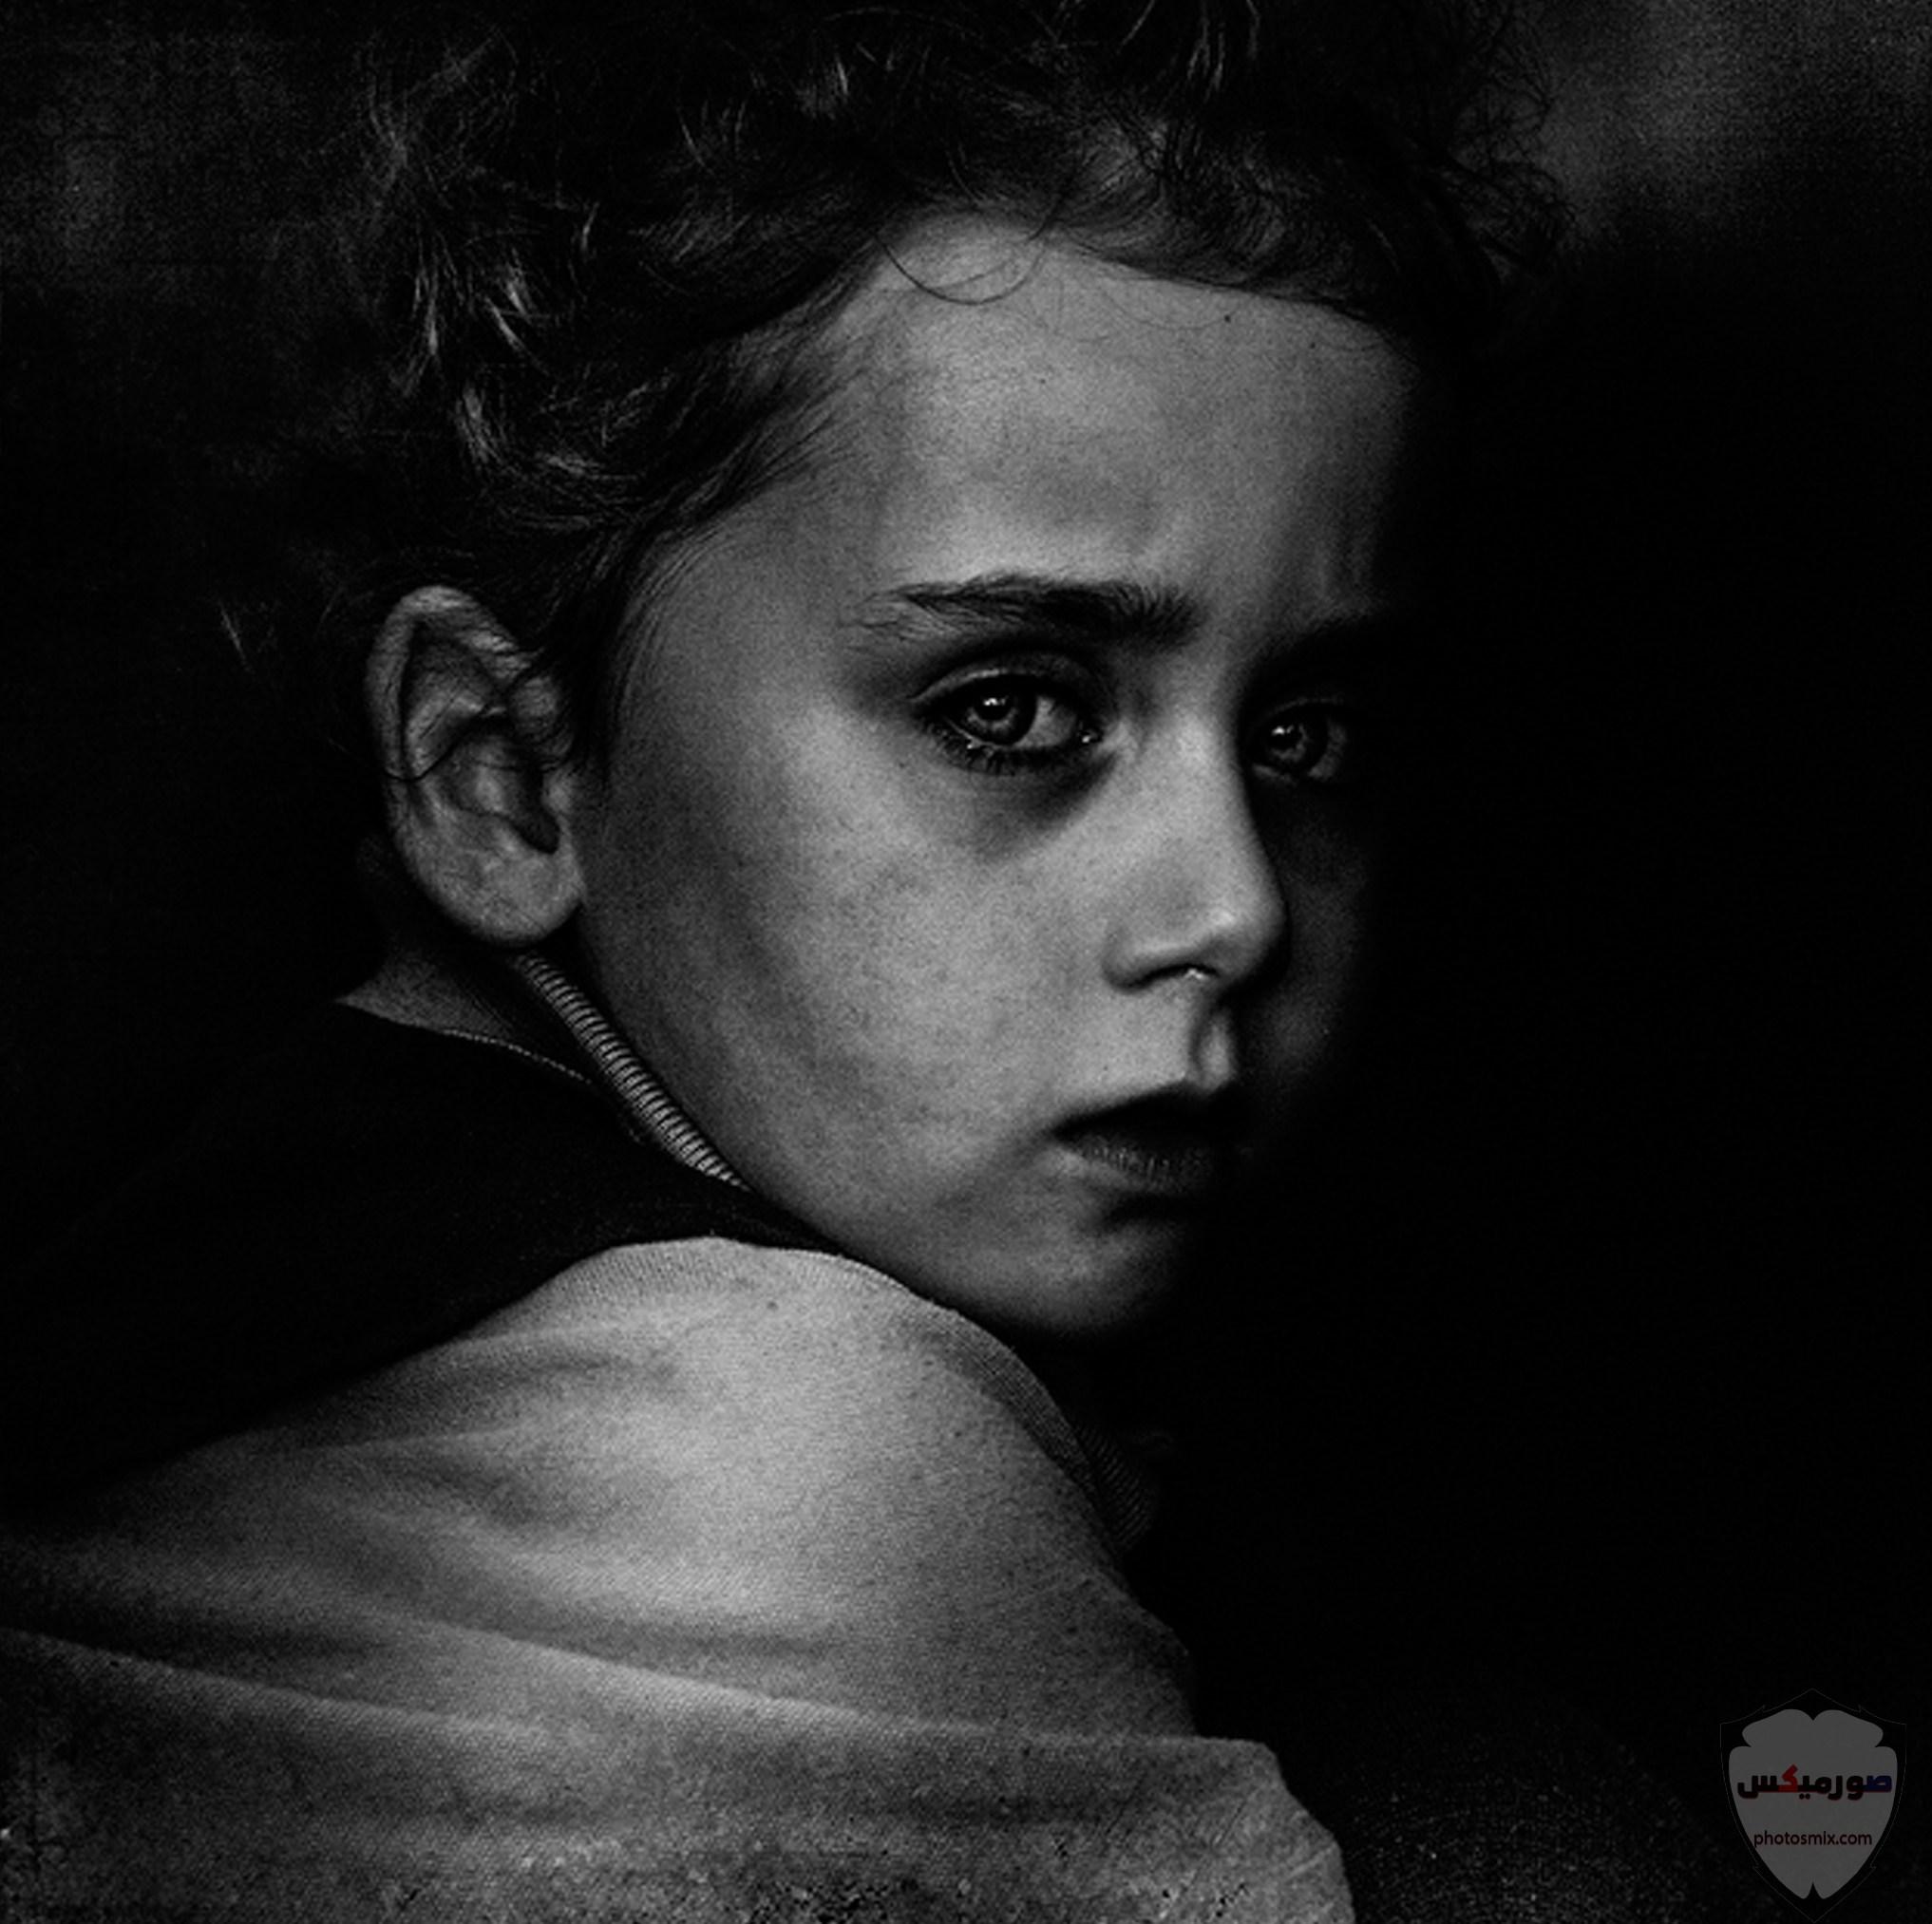 رمزيات شباب 2020 صور شباب كيوت رمزيات كشخة 10